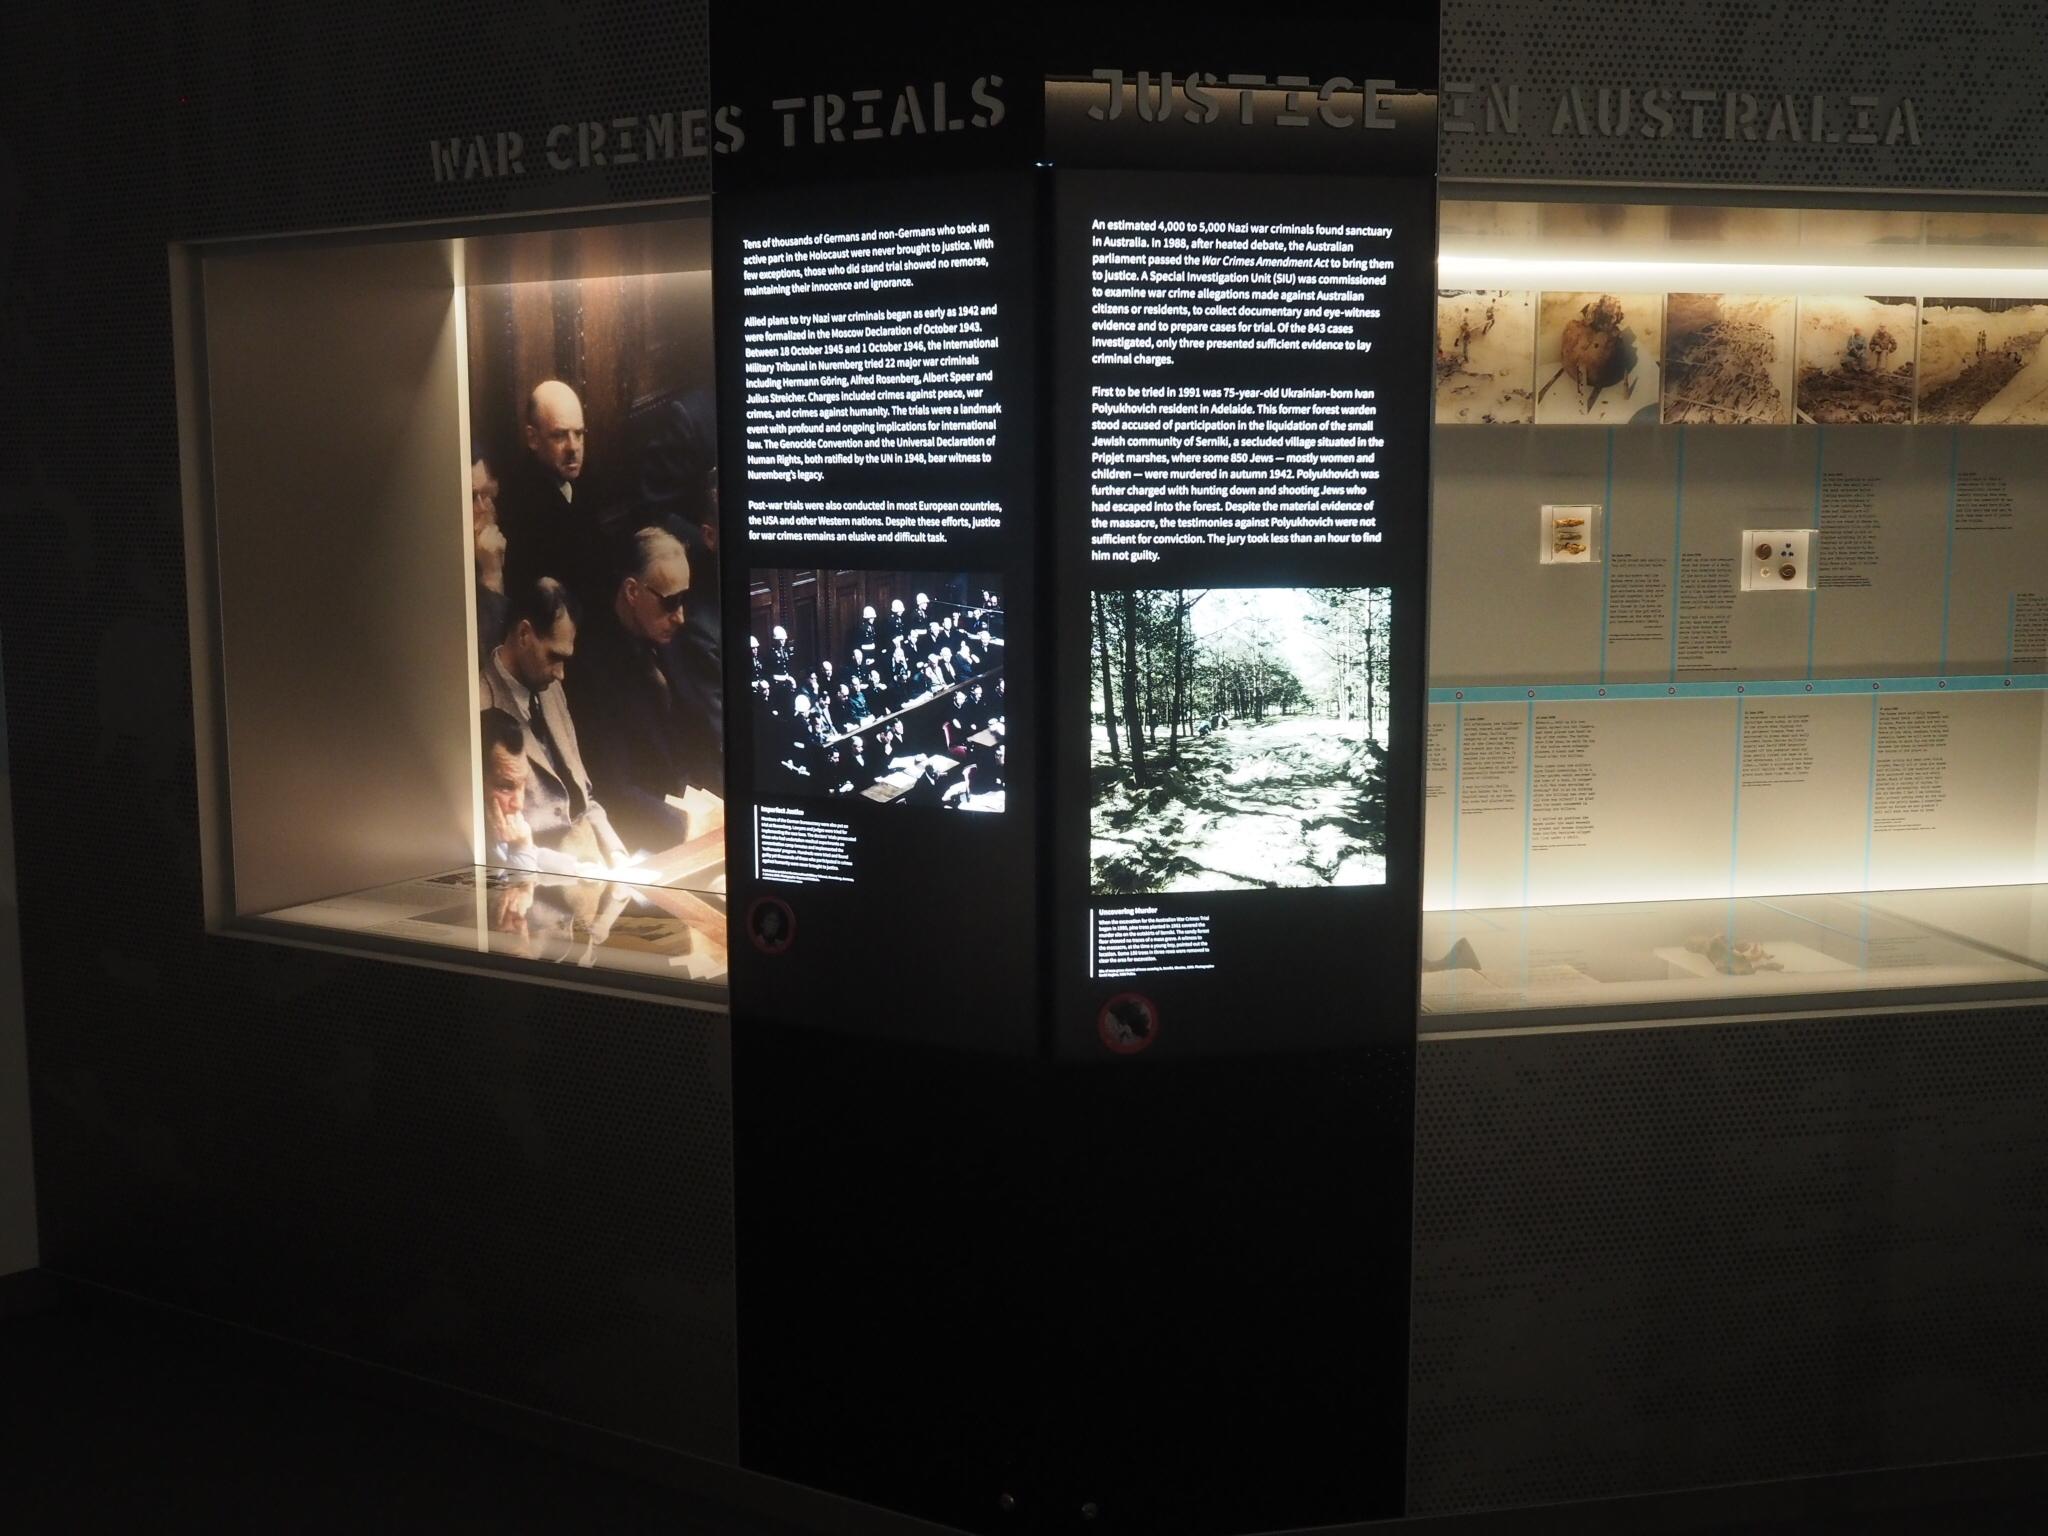 The Sydney Jewish Museum